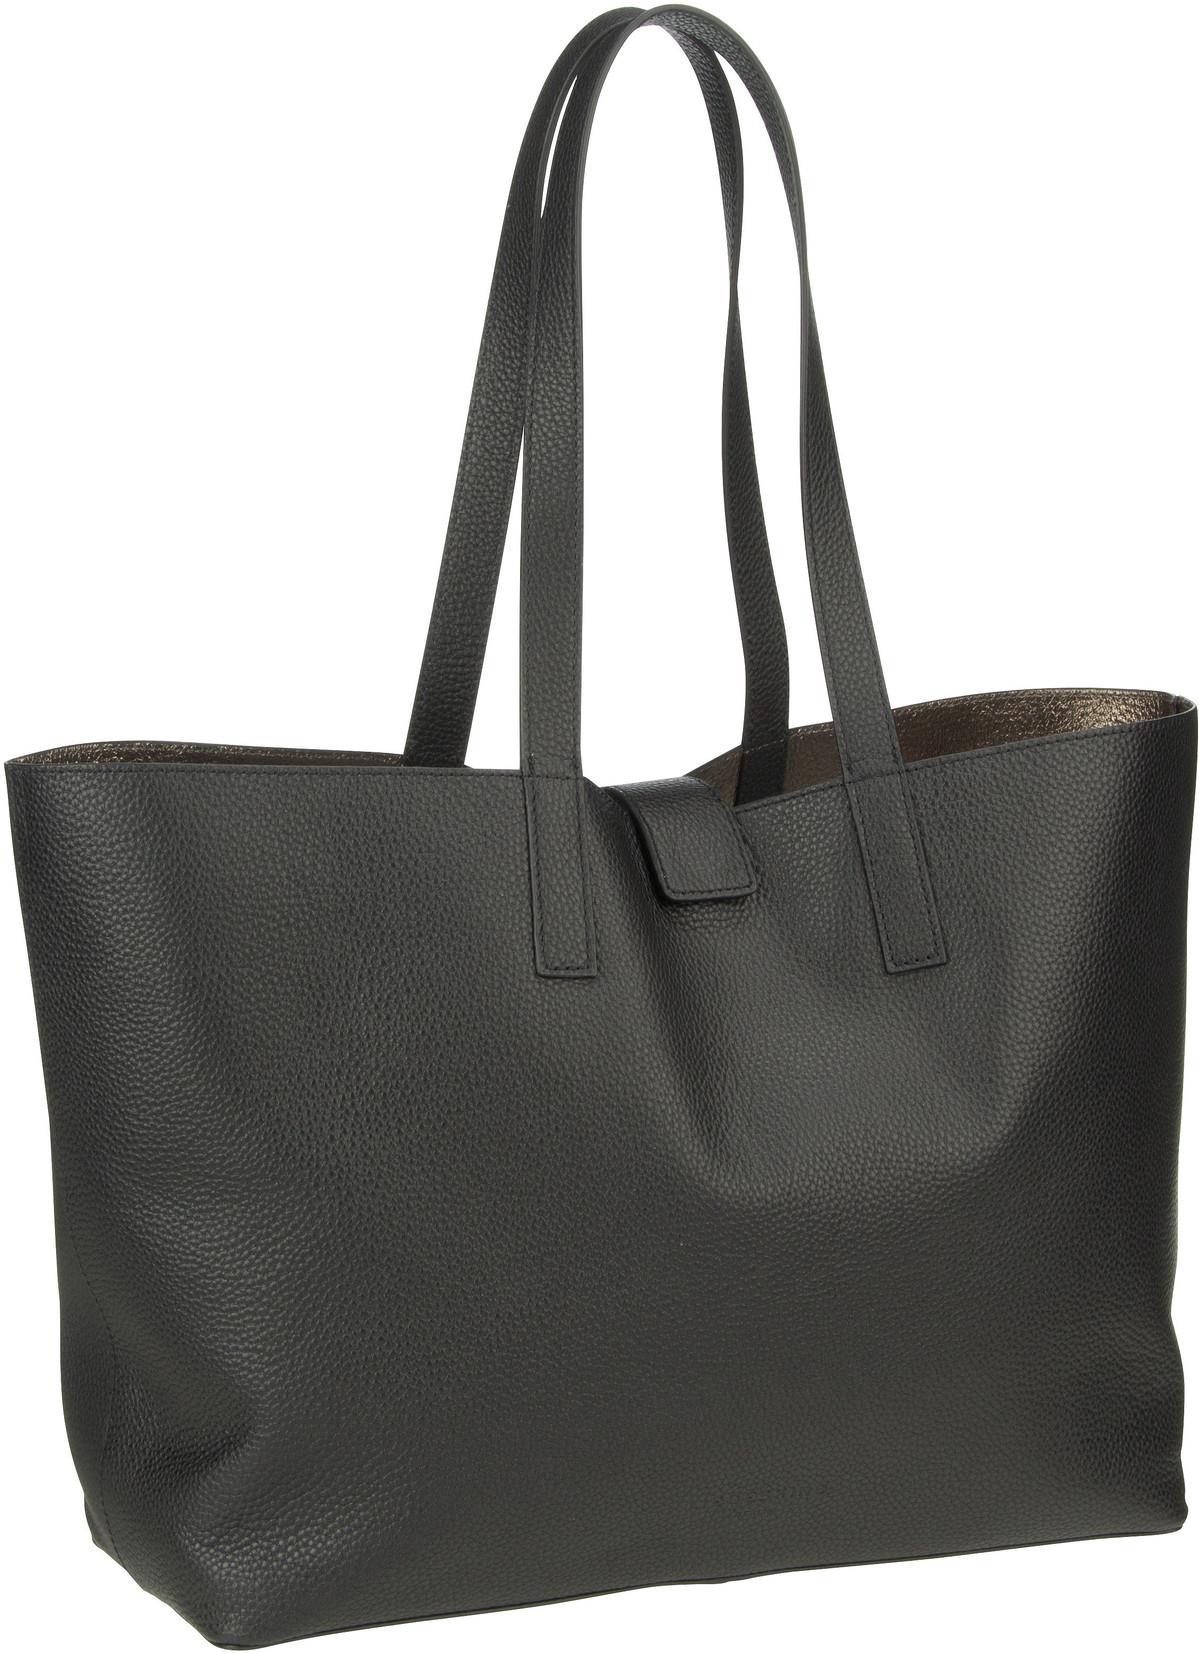 Berlin Handtasche Carli 20 Black